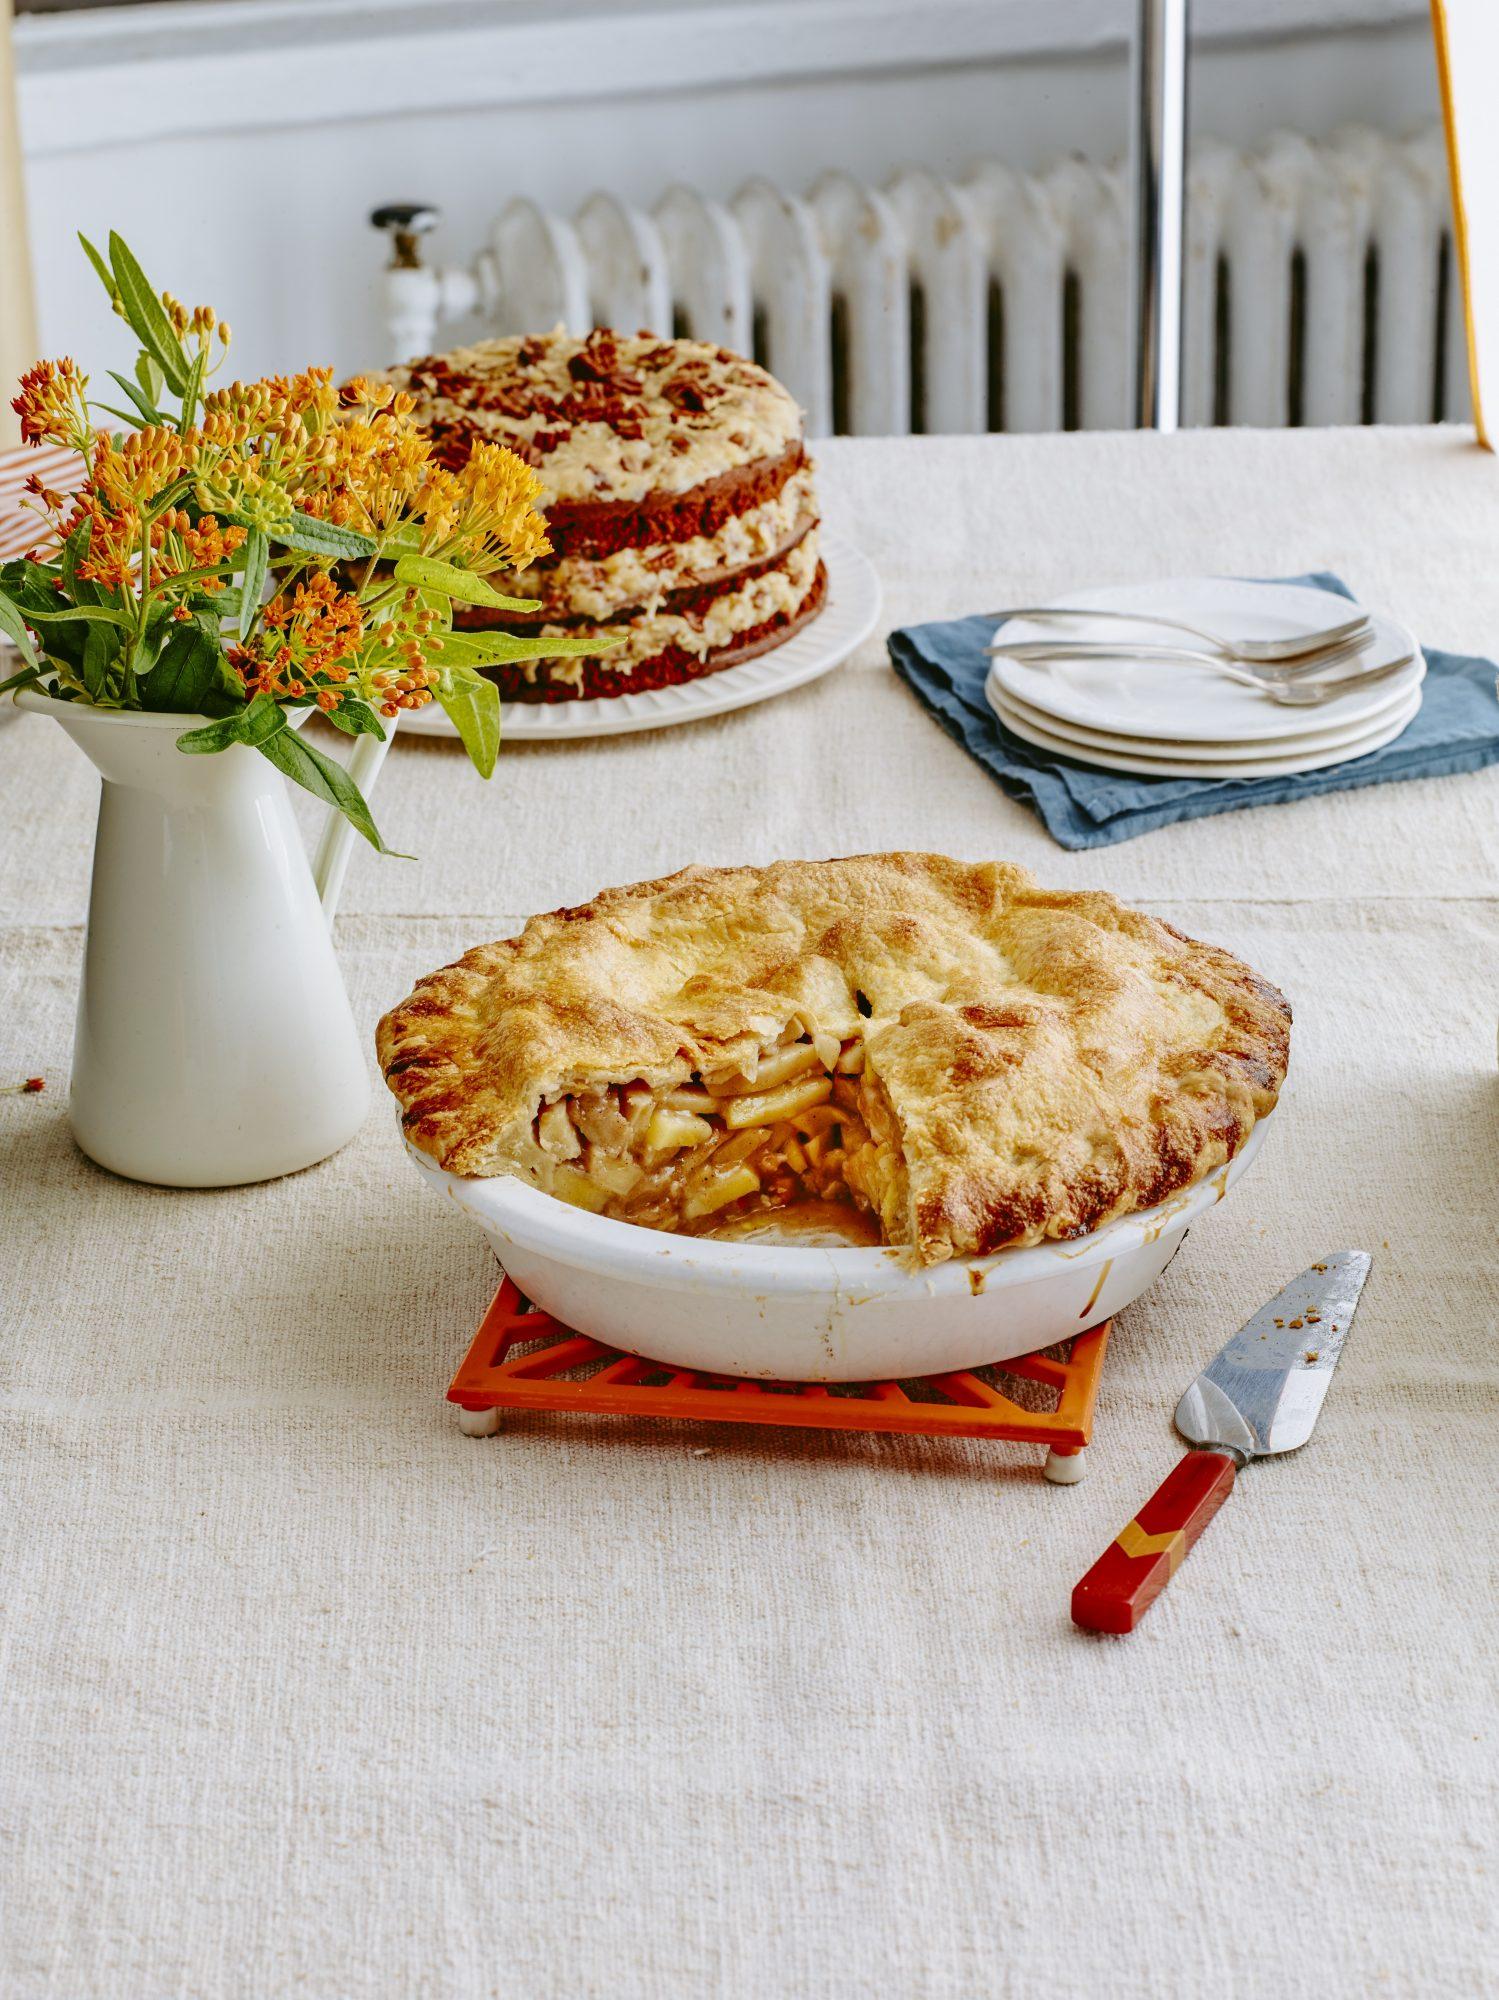 Emeril Lagasse's Cinnamon and Spice Deep-Dish Apple Pie